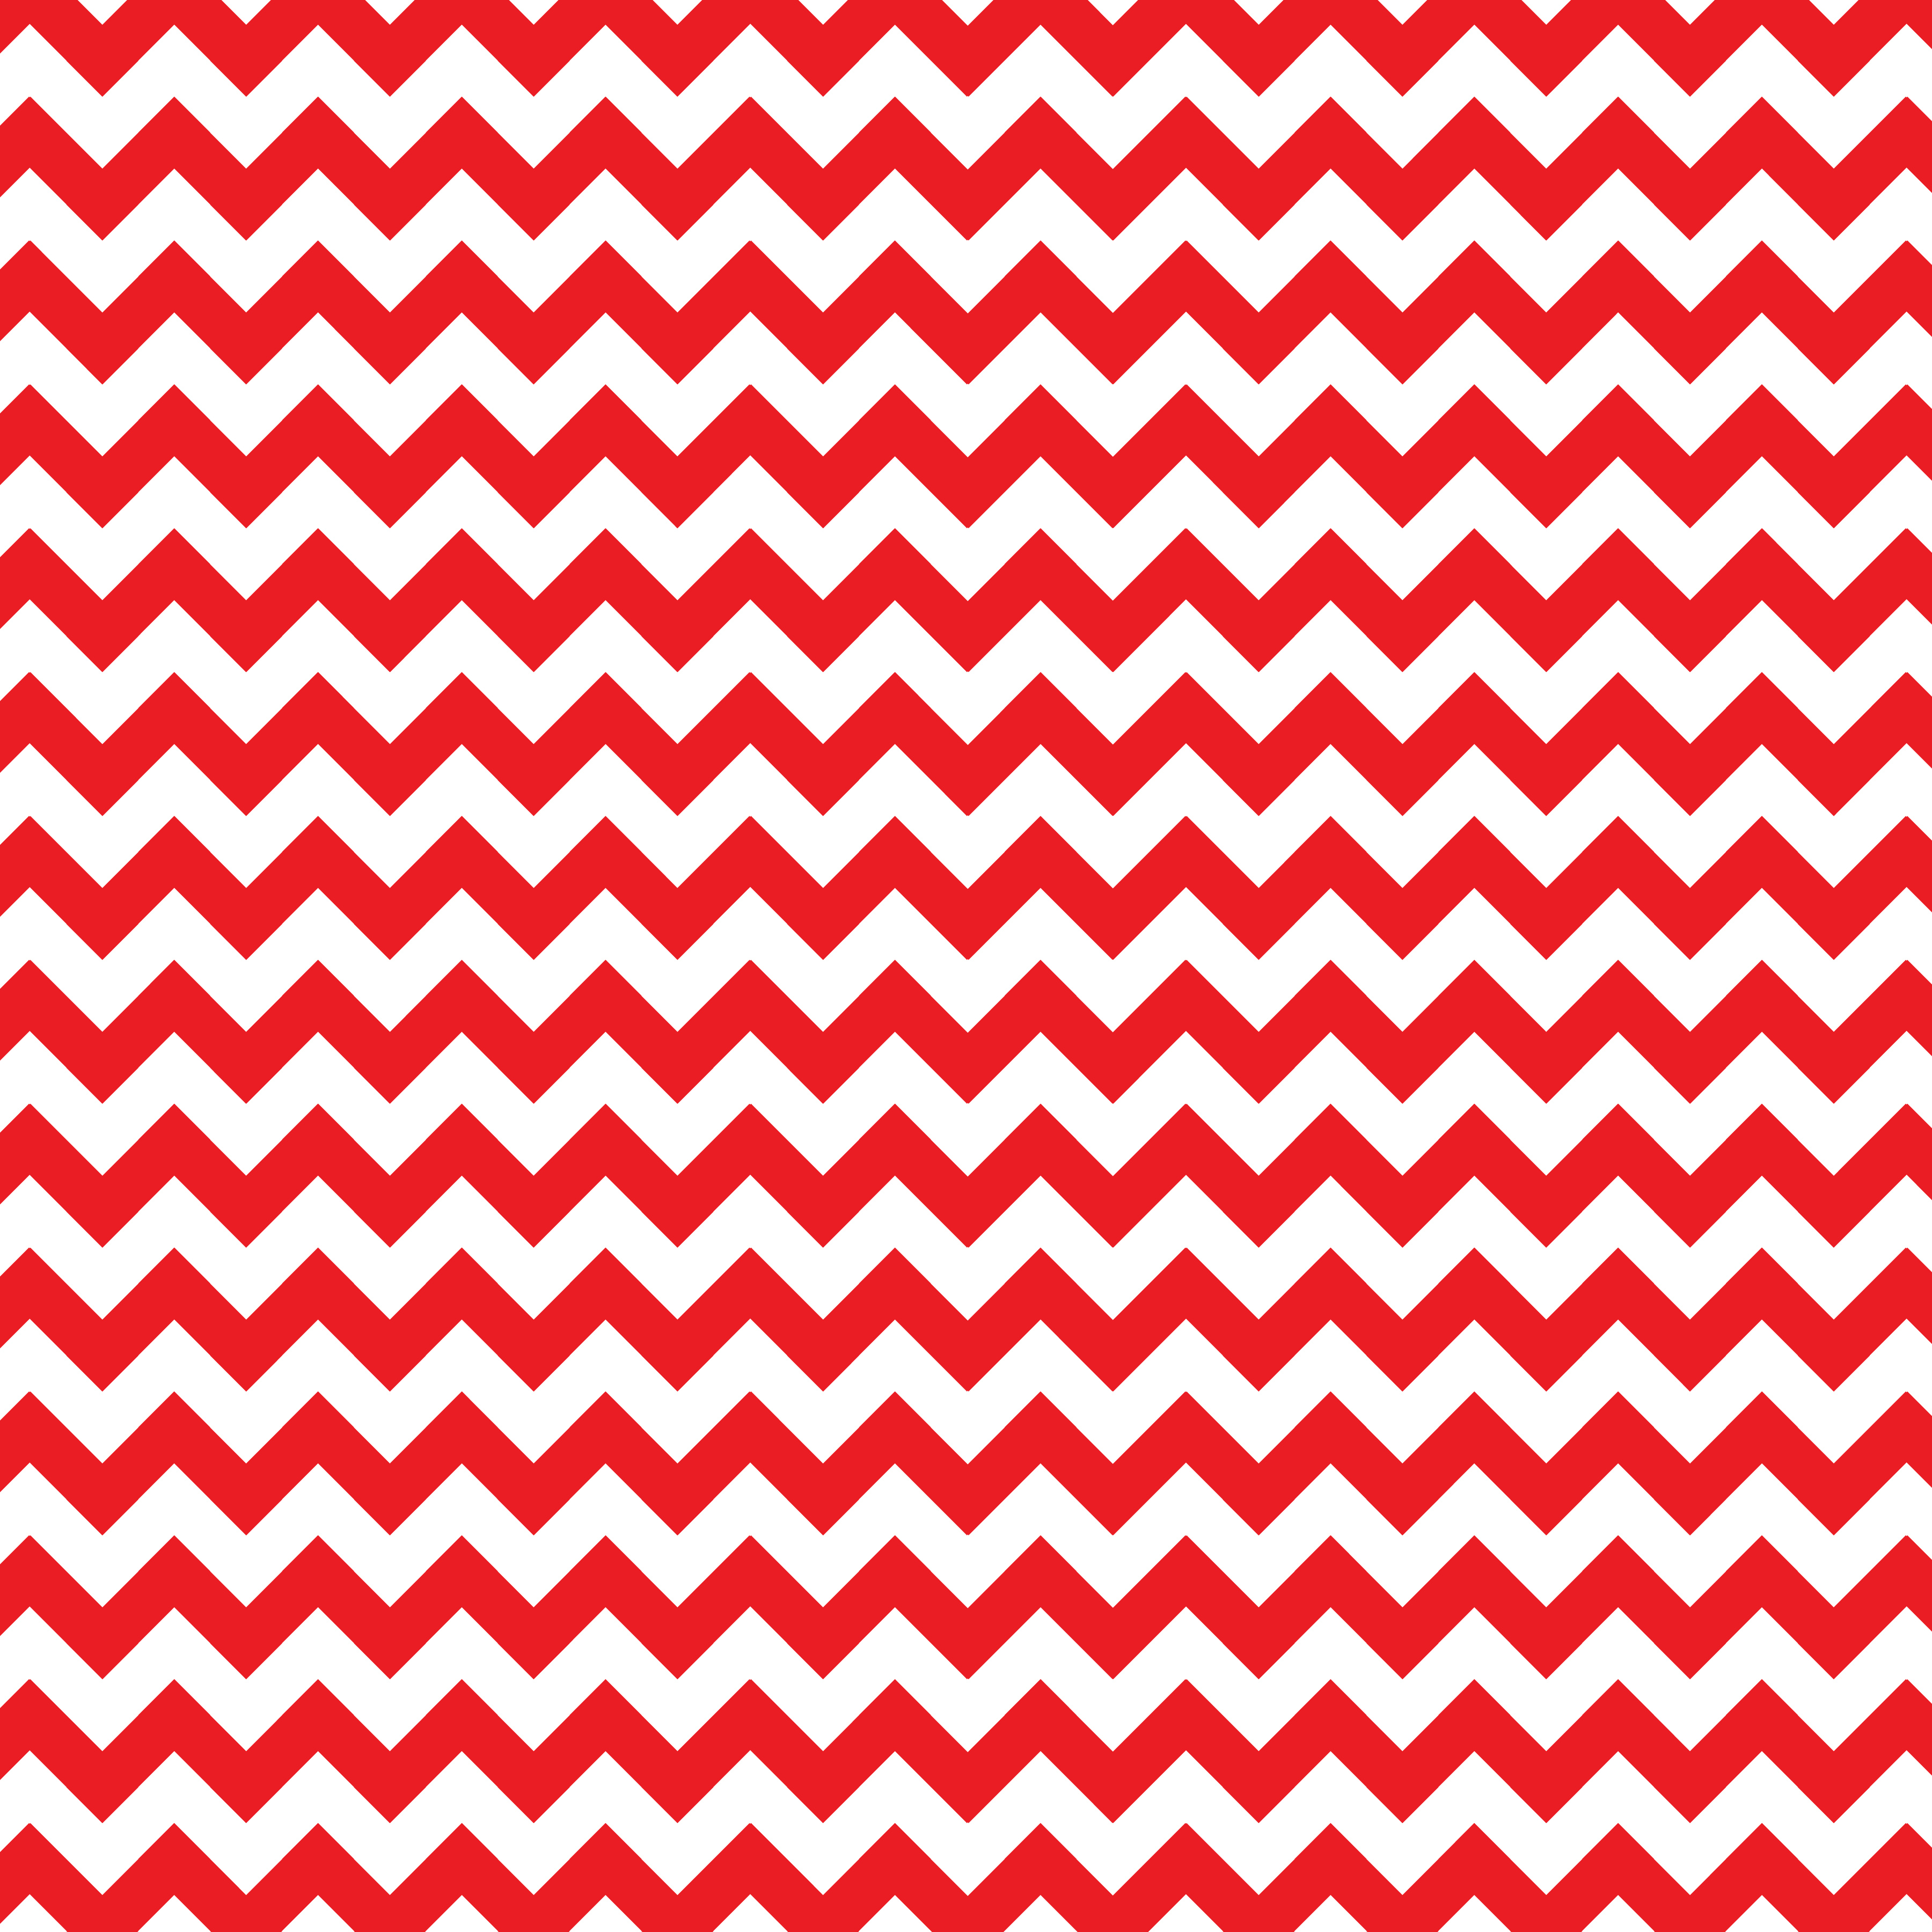 Red and White Chevron 3600x3600